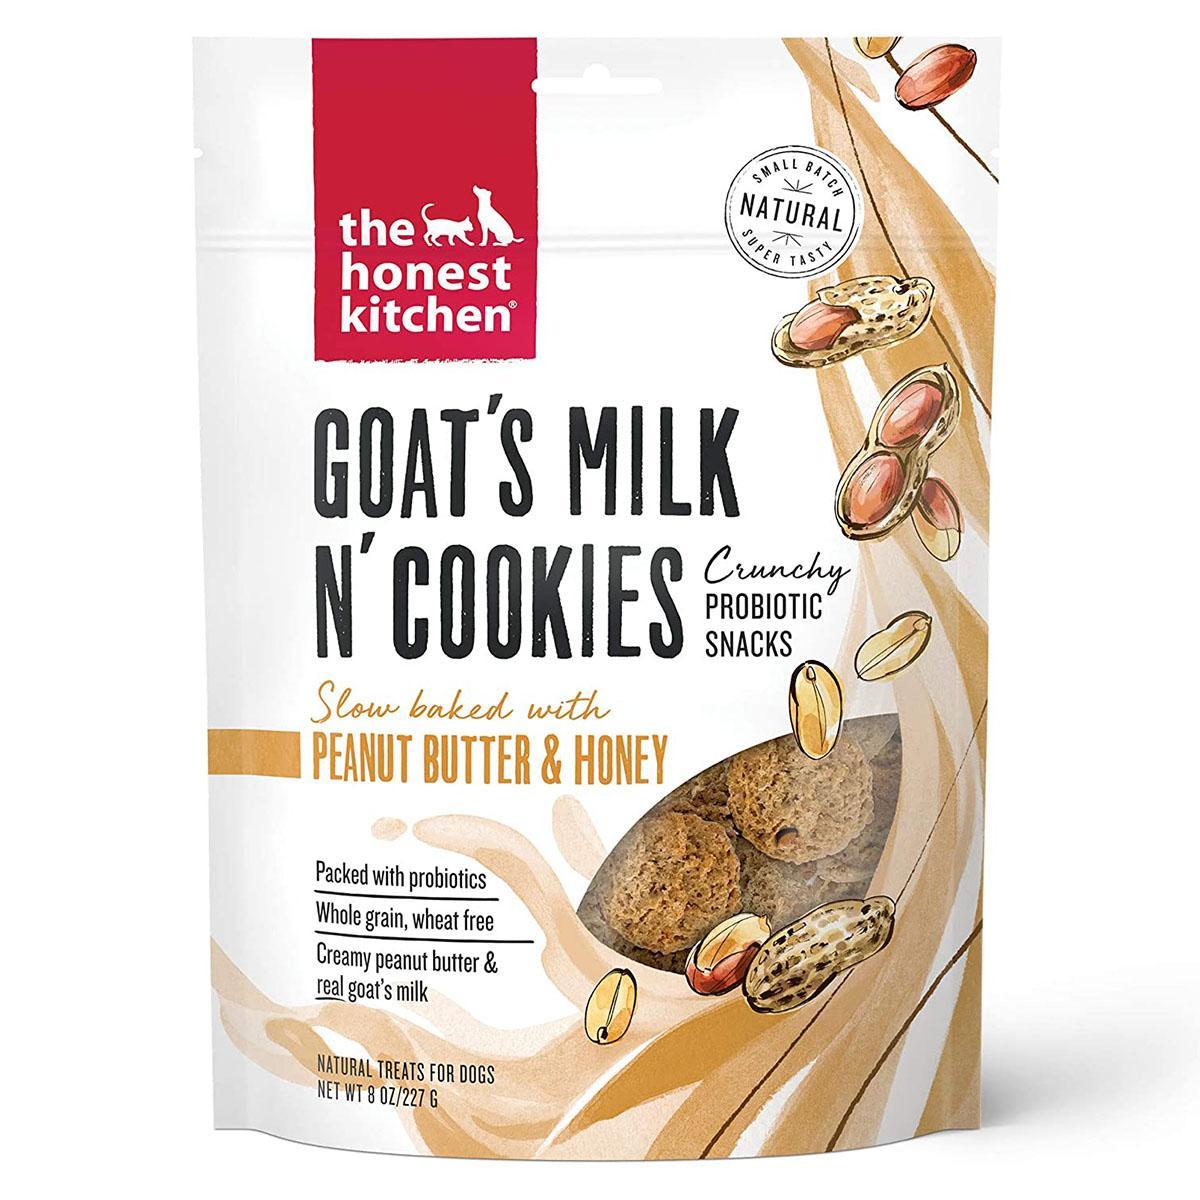 The Honest Kitchen Goat's Milk N' Cookies Dog Treats - Peanut Butter & Honey Recipe